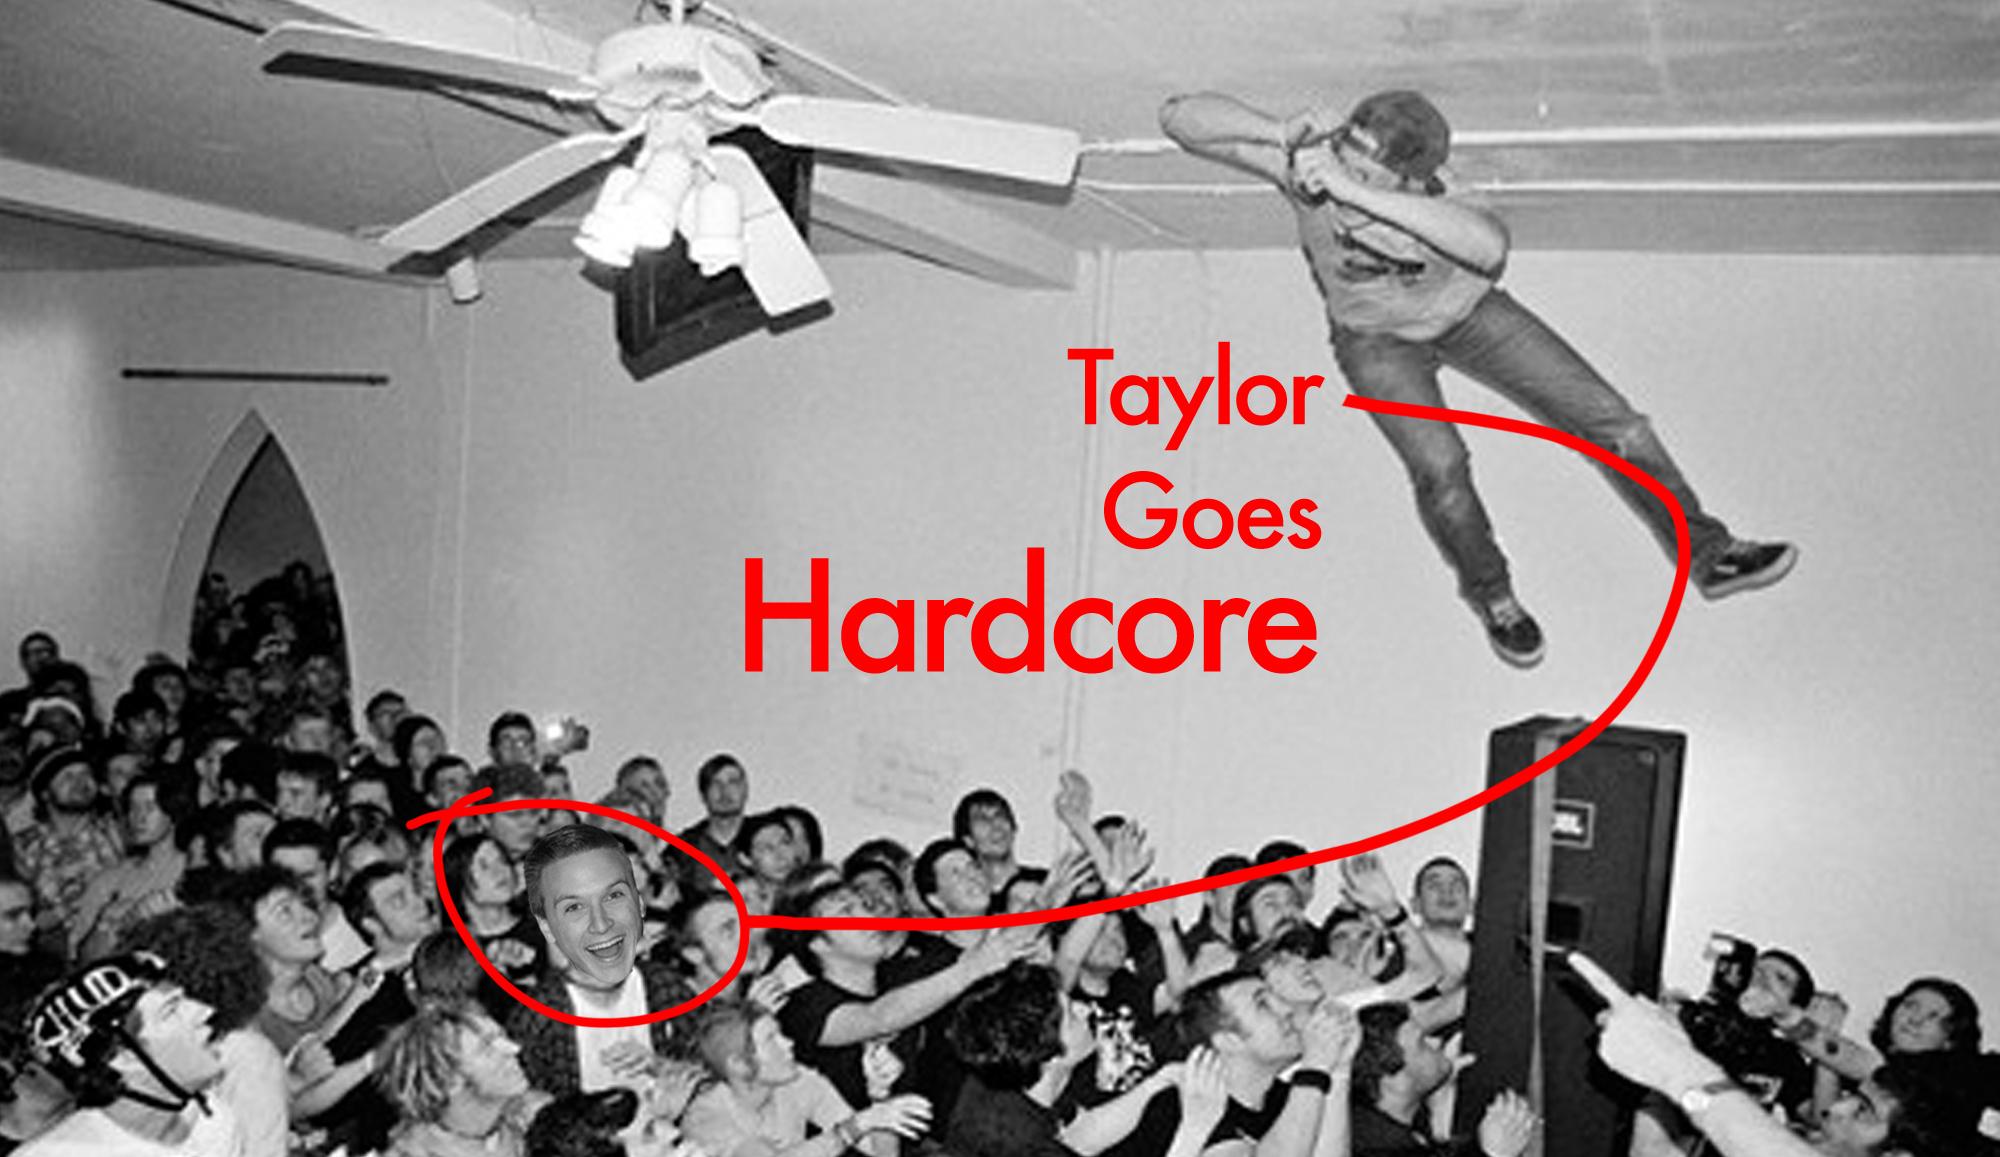 Hardcore-Goes-Taylor.jpg